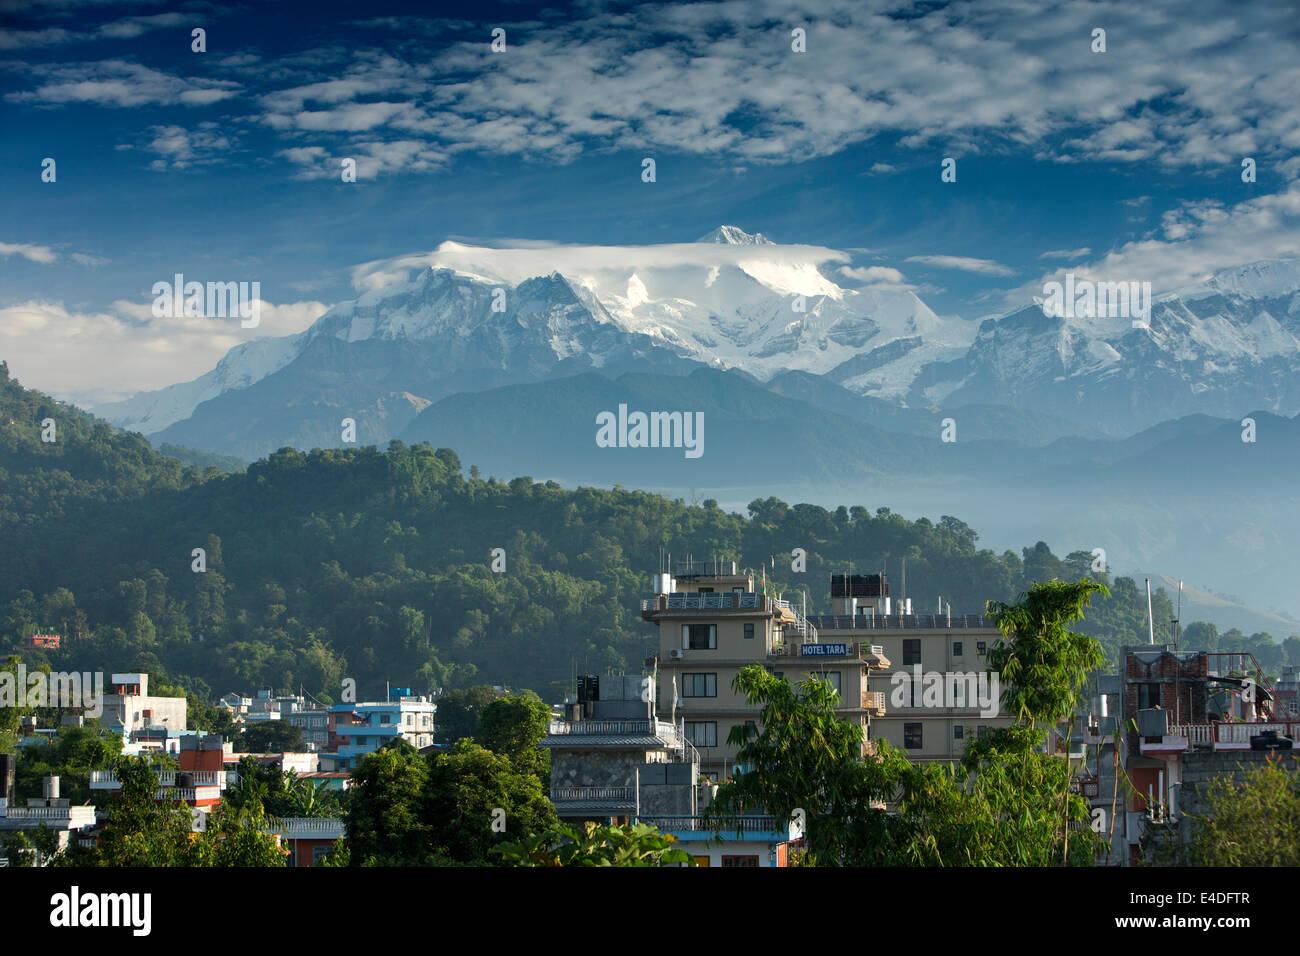 Nepal, Pokhara, Annapurna Mountain Range, in early morning light above Pokhara - Stock Image